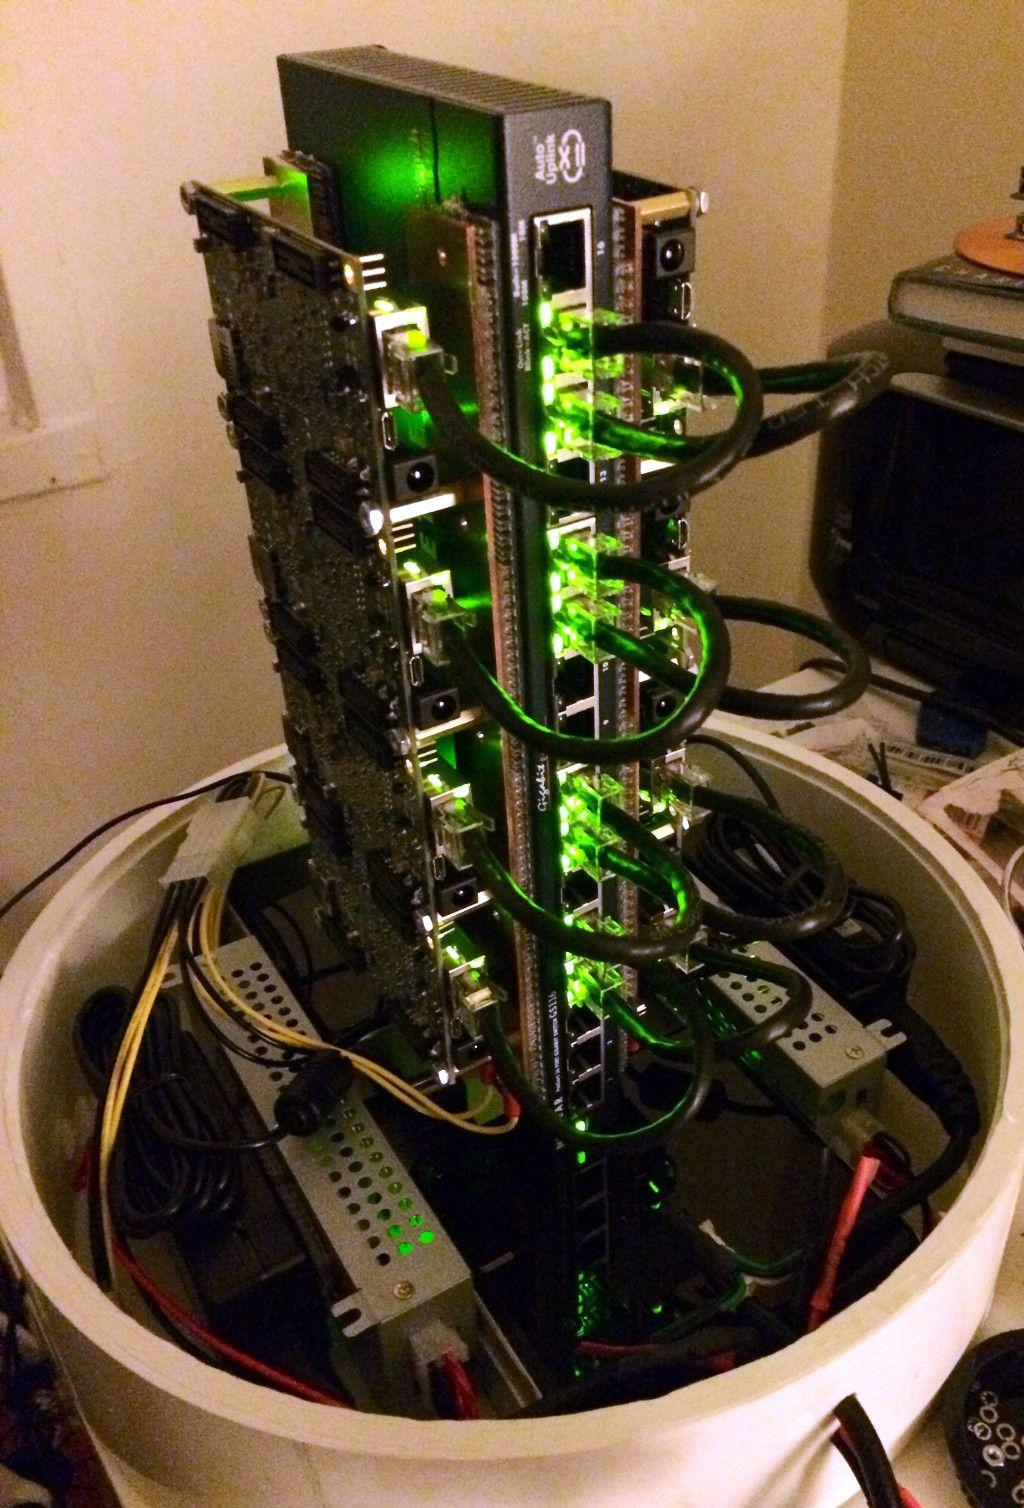 Home made super computer using Apple Mac Pro (bin) as